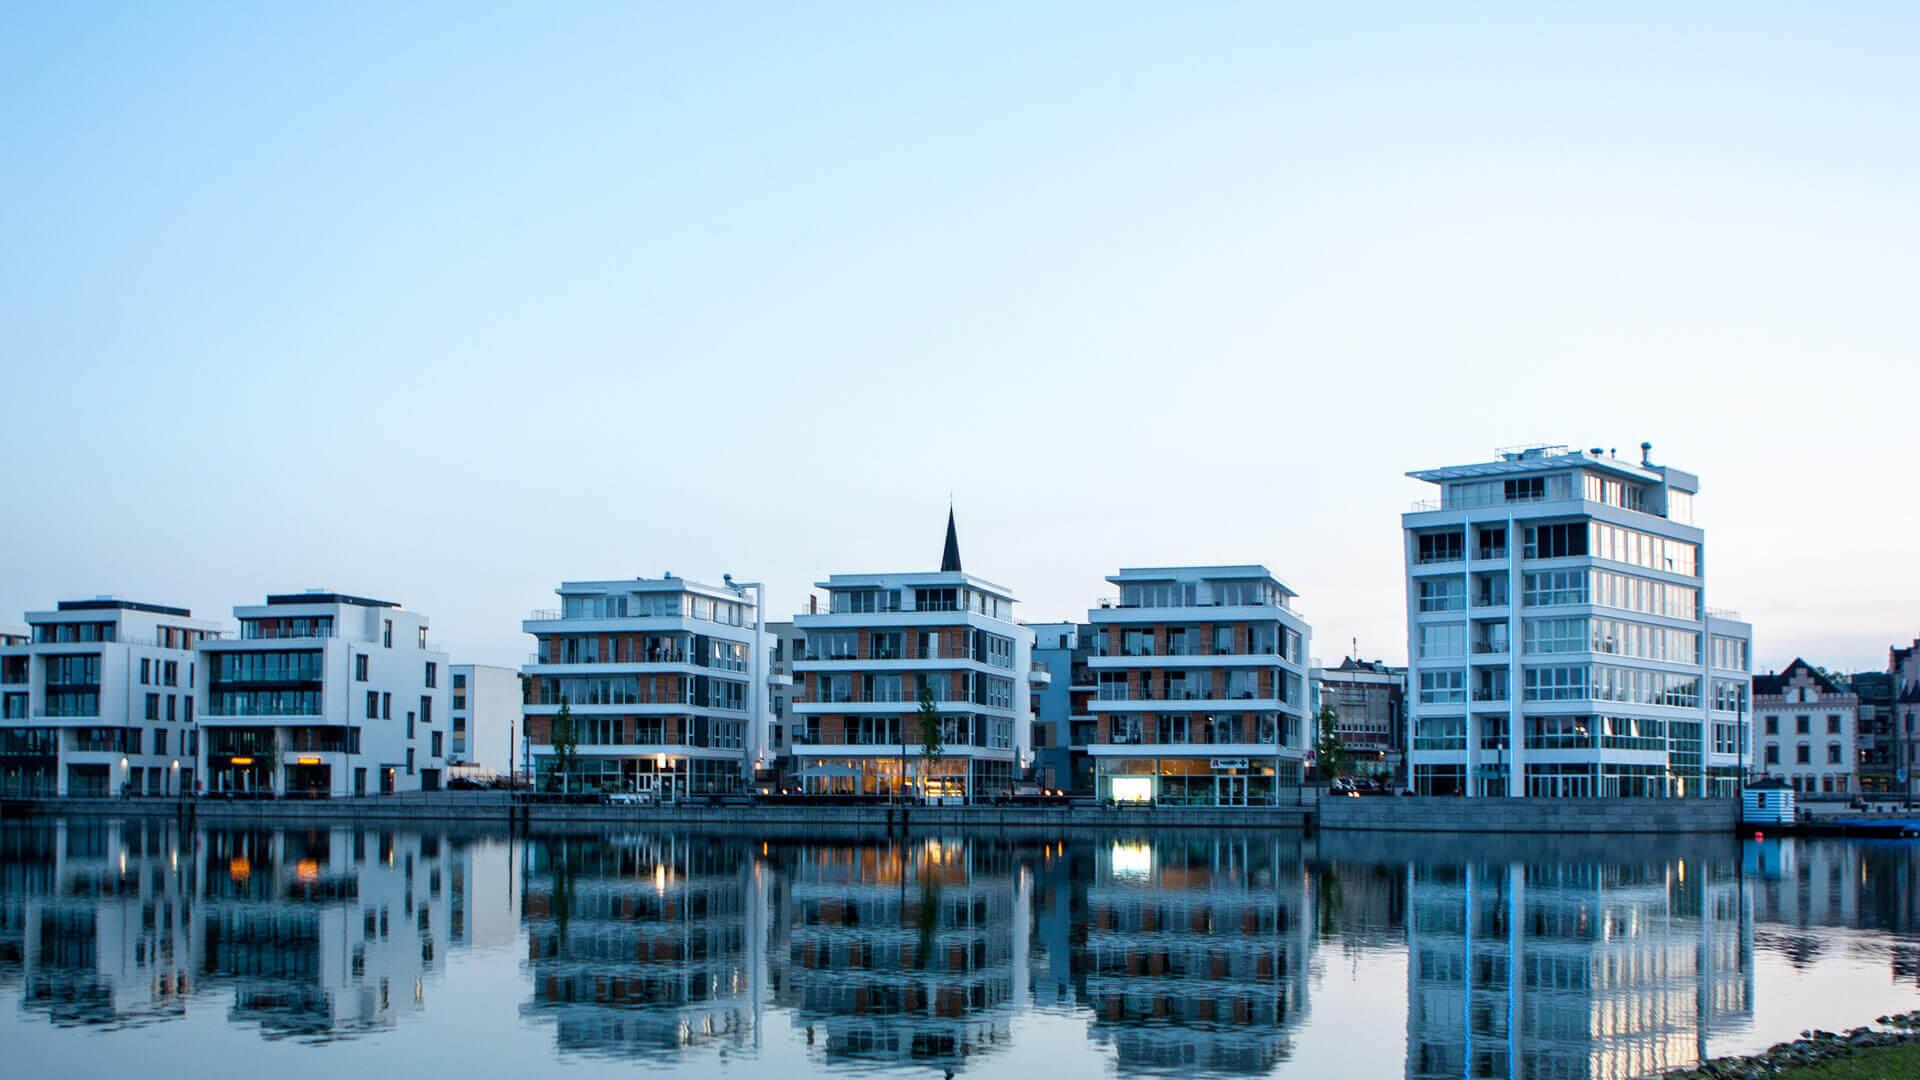 Phönix-See, Dortmund